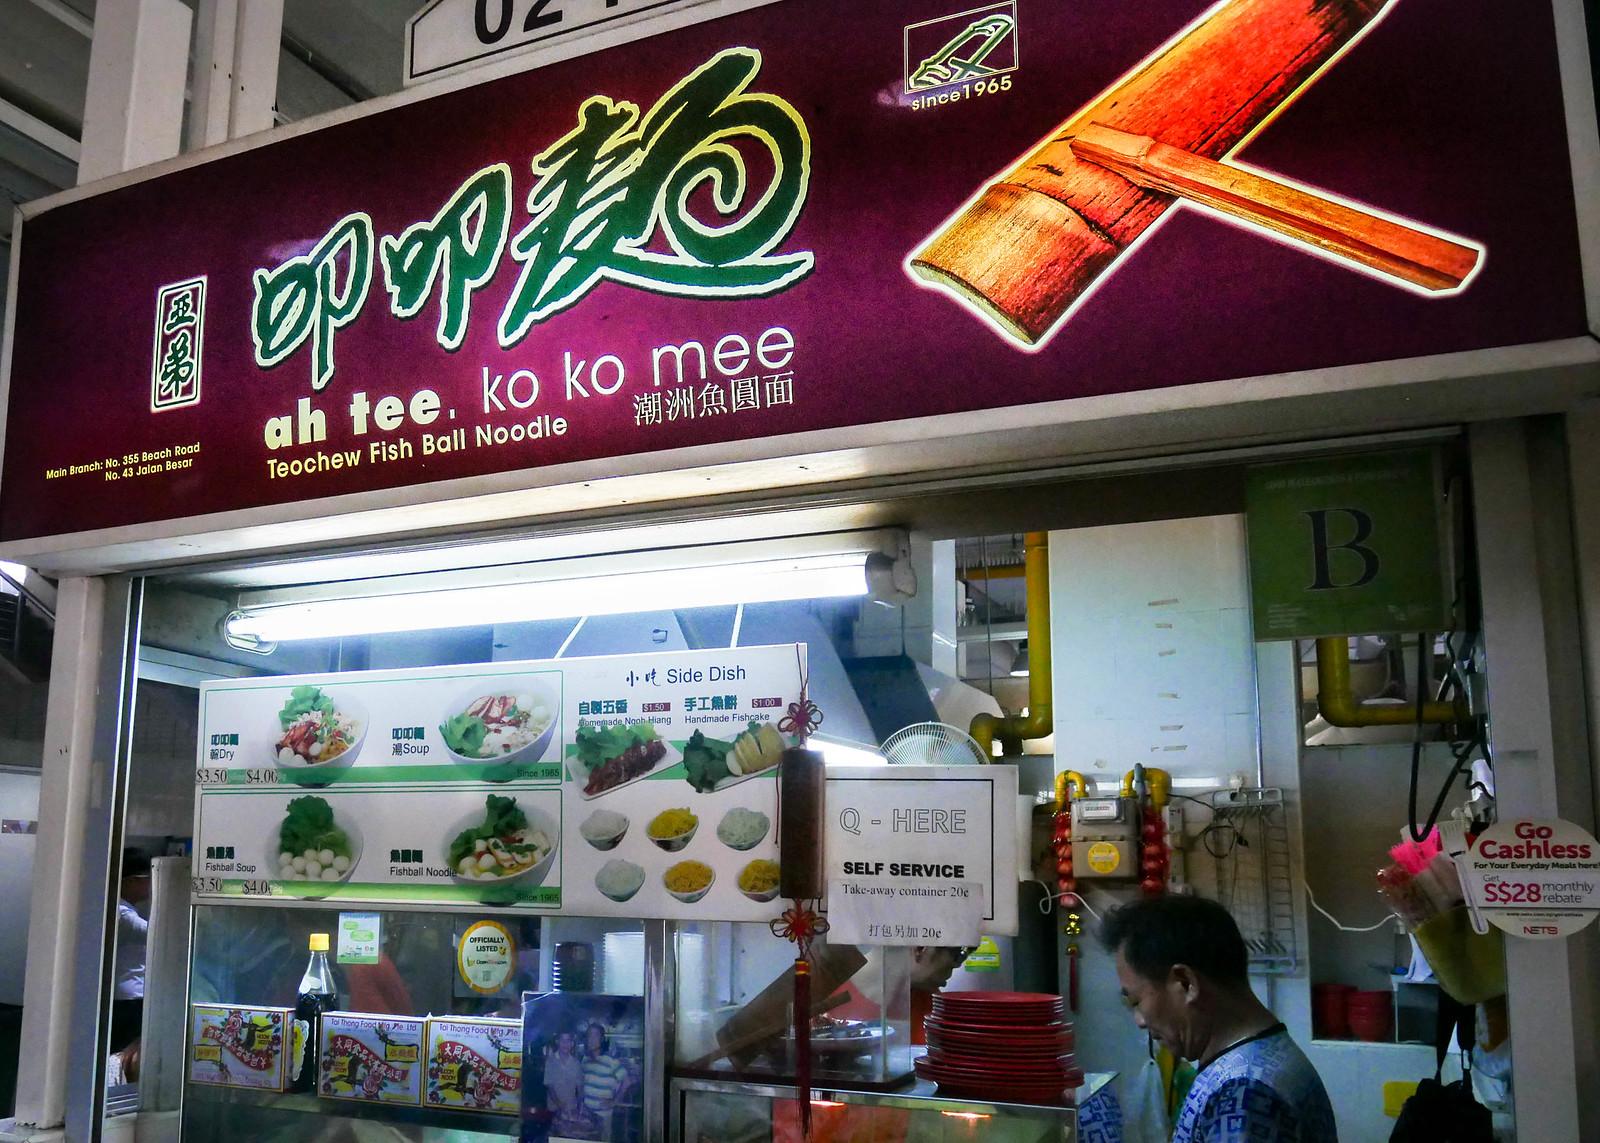 amoy street food centre chicken